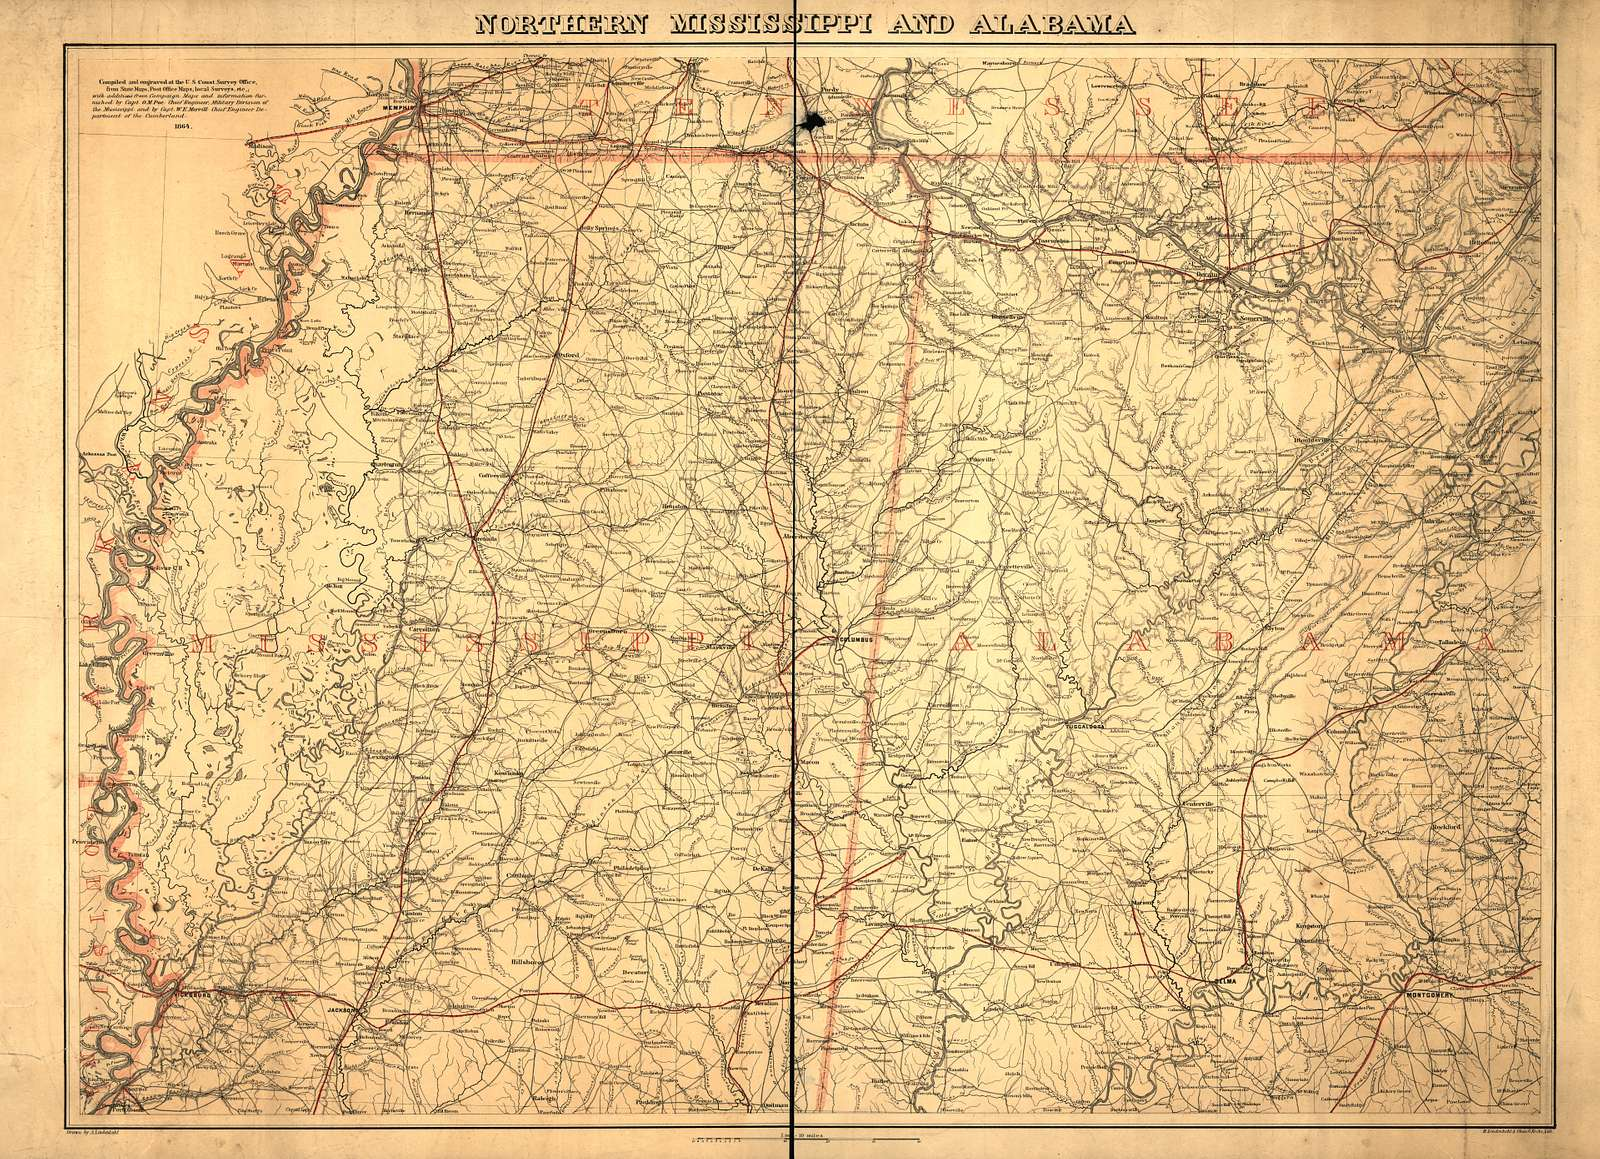 Northern Mississippi and Alabama